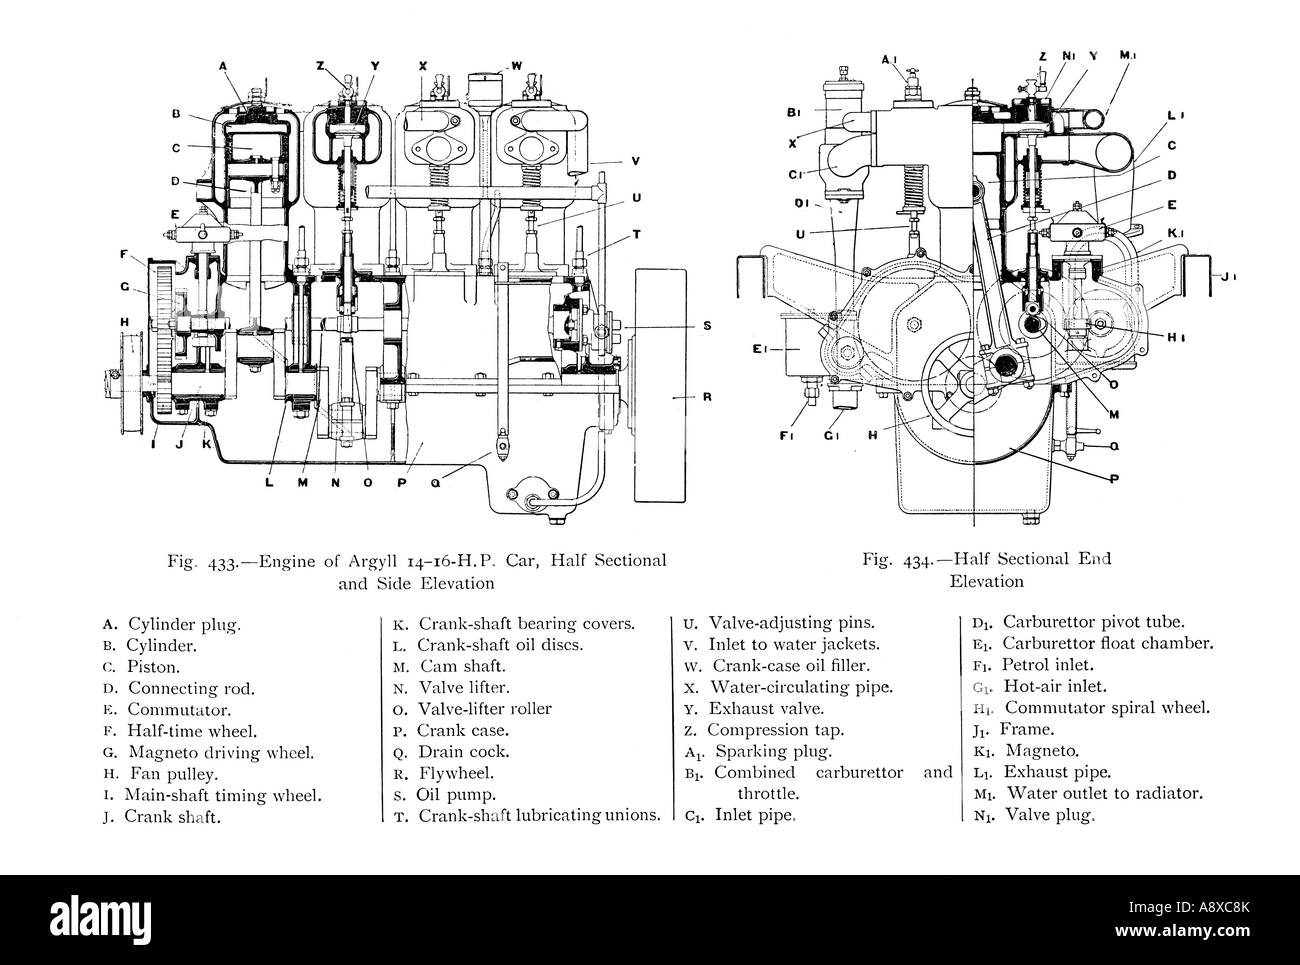 4 stroke petrol engine diagram 2001 ford taurus firing order kn igesetze de of 14 16 horse power argyll four cyliner stock rh alamy com